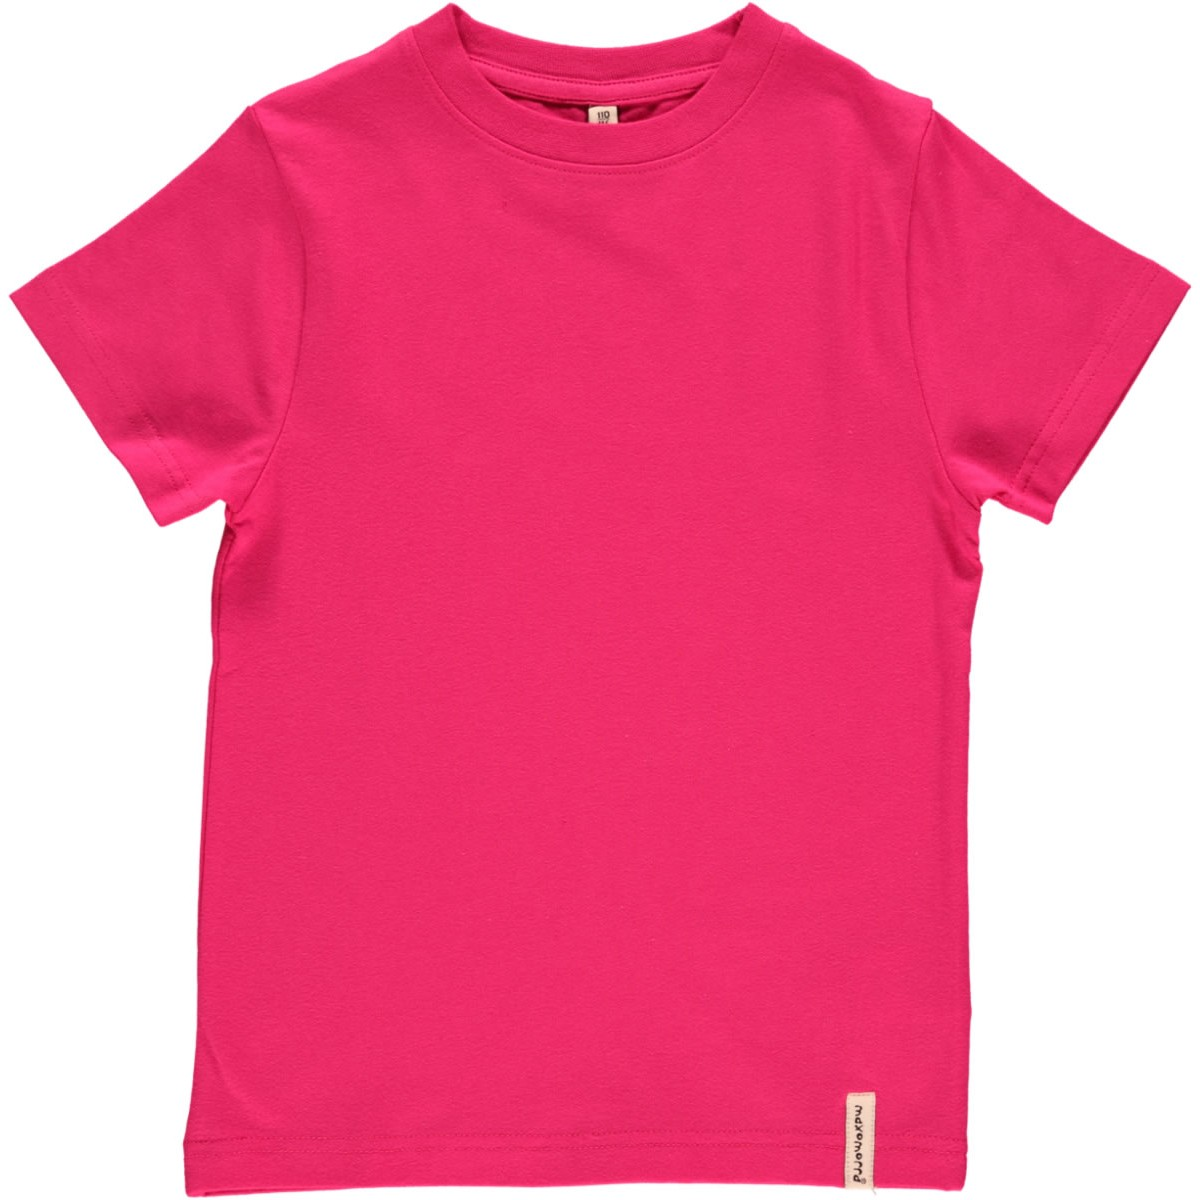 Maxomorra Organic Kids SS Top Cerise Pink